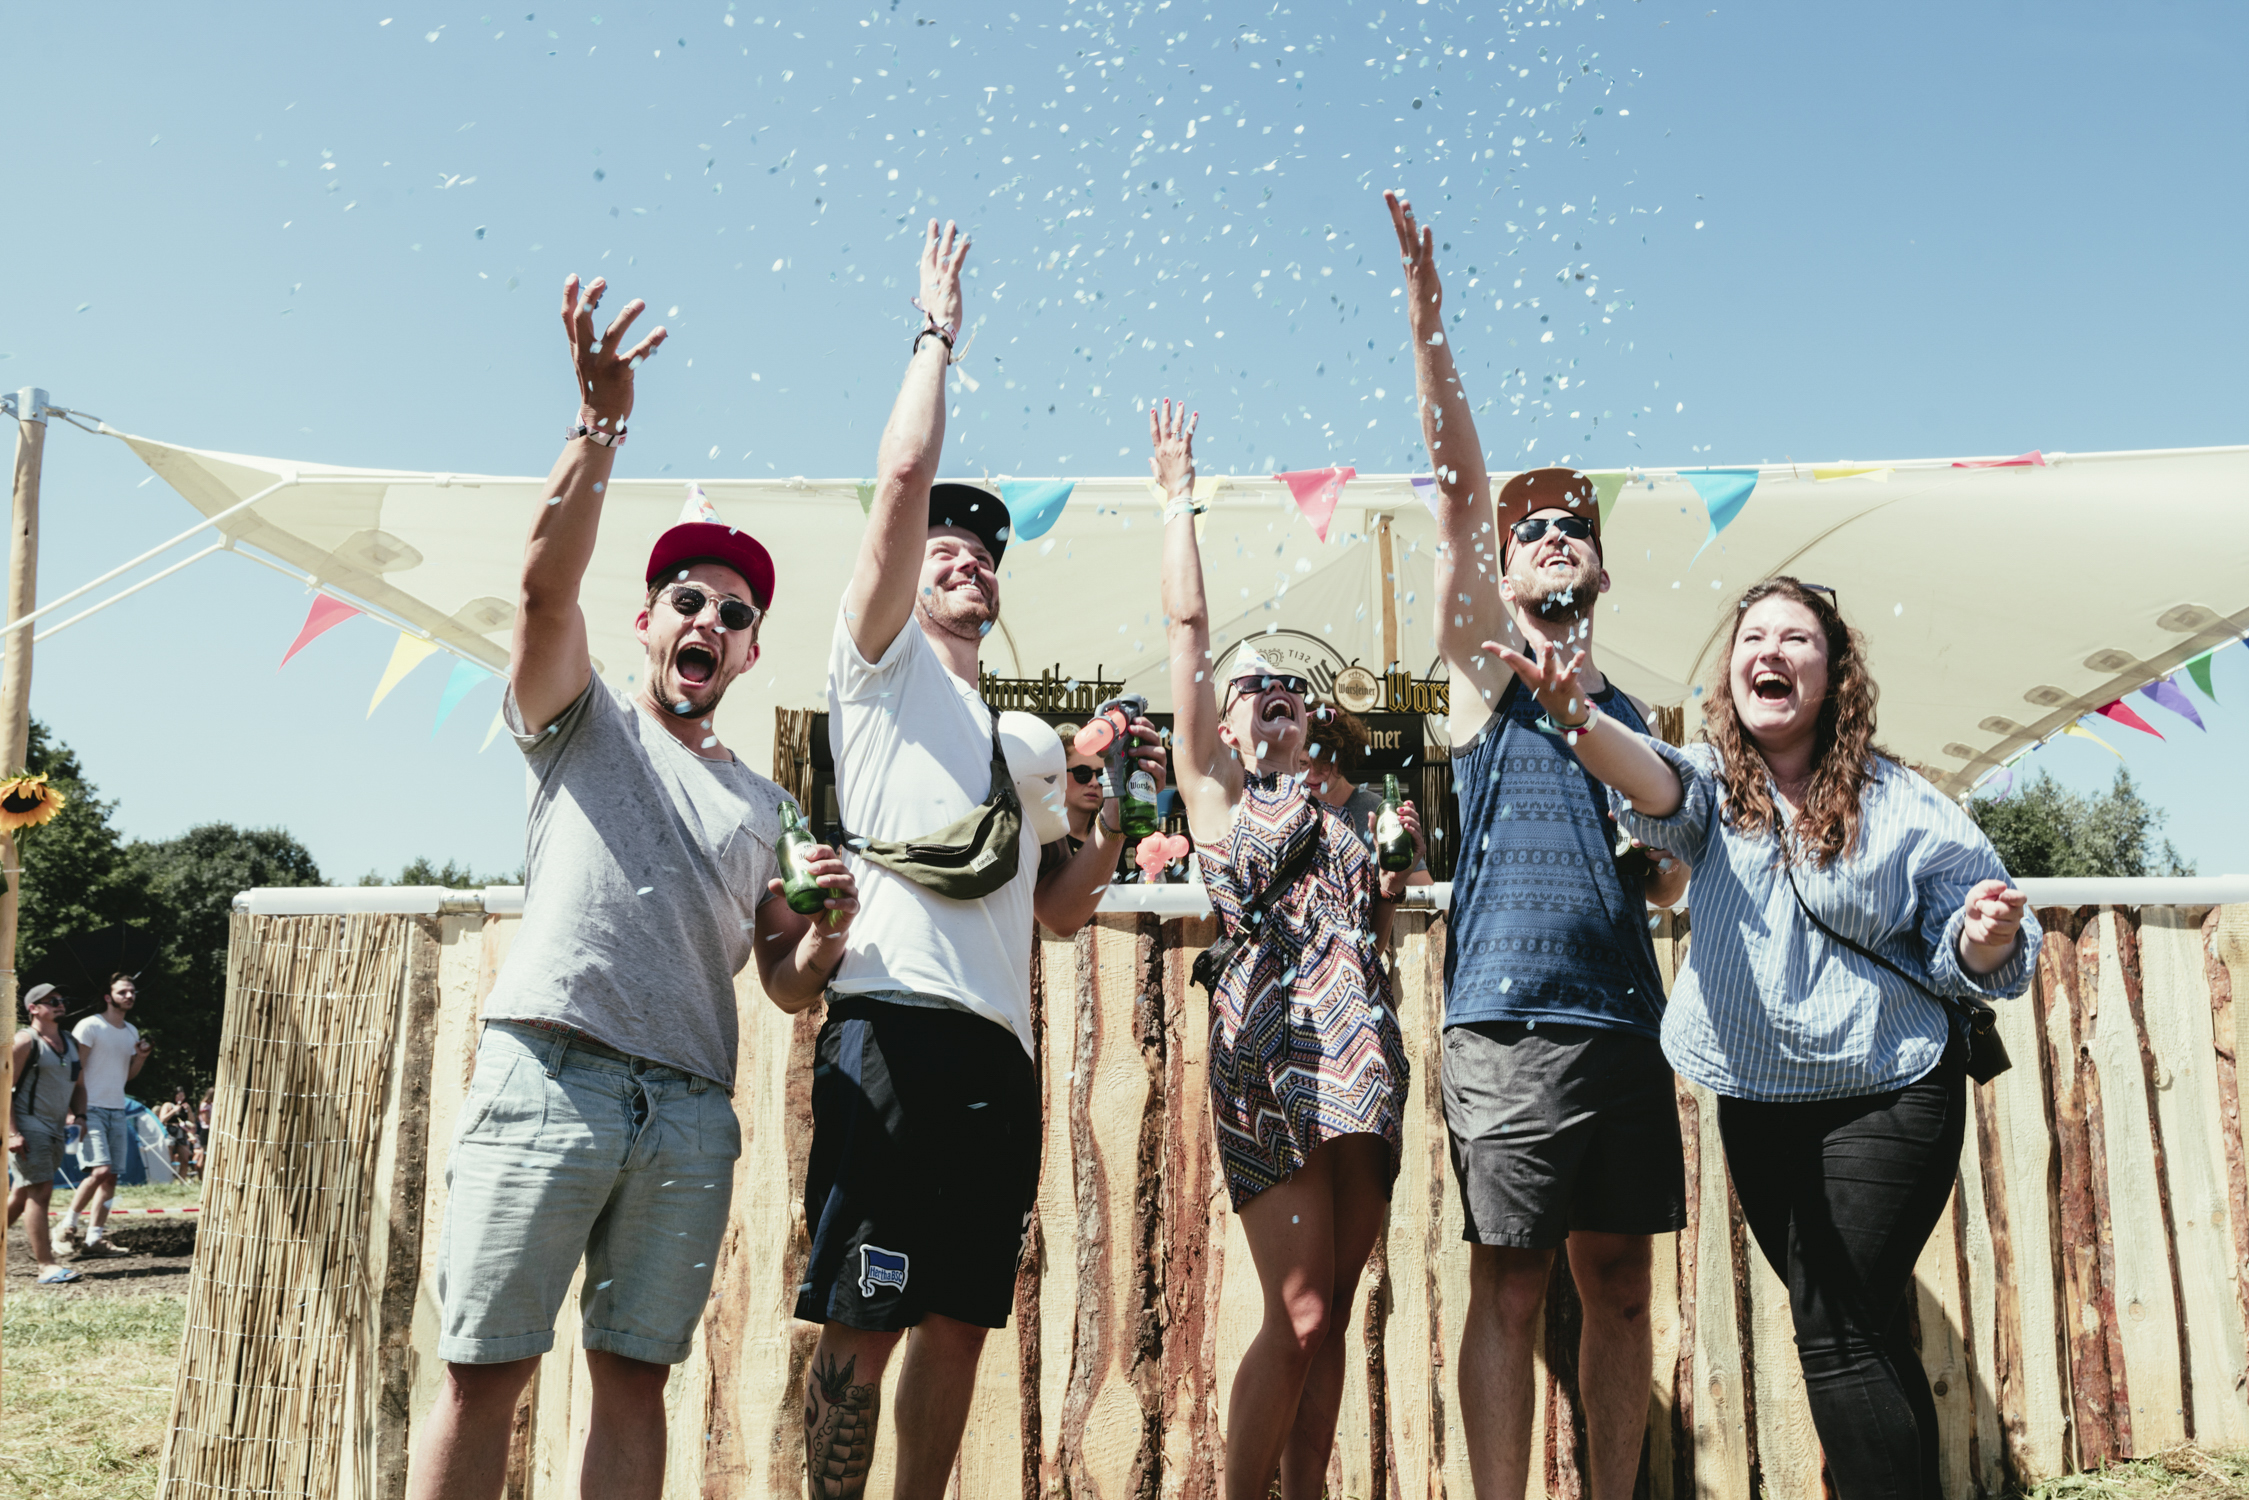 New Horizons Campingrave Gewinnspiel Teilnahmebedingungen